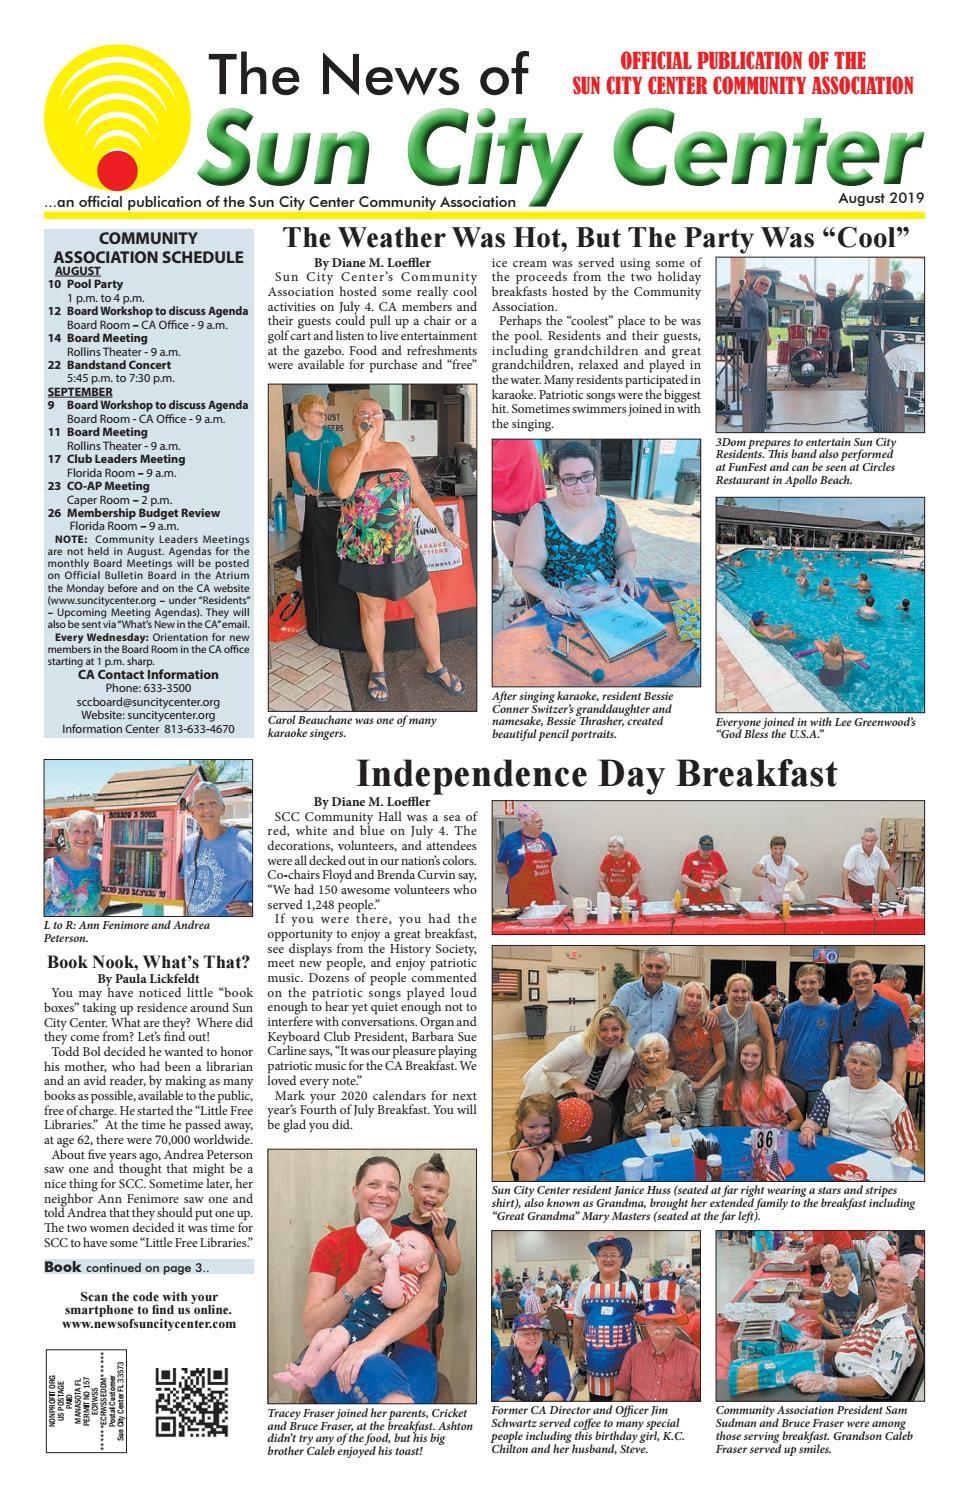 News Of Sun City Center August 2019 By The News Of Sun City Center